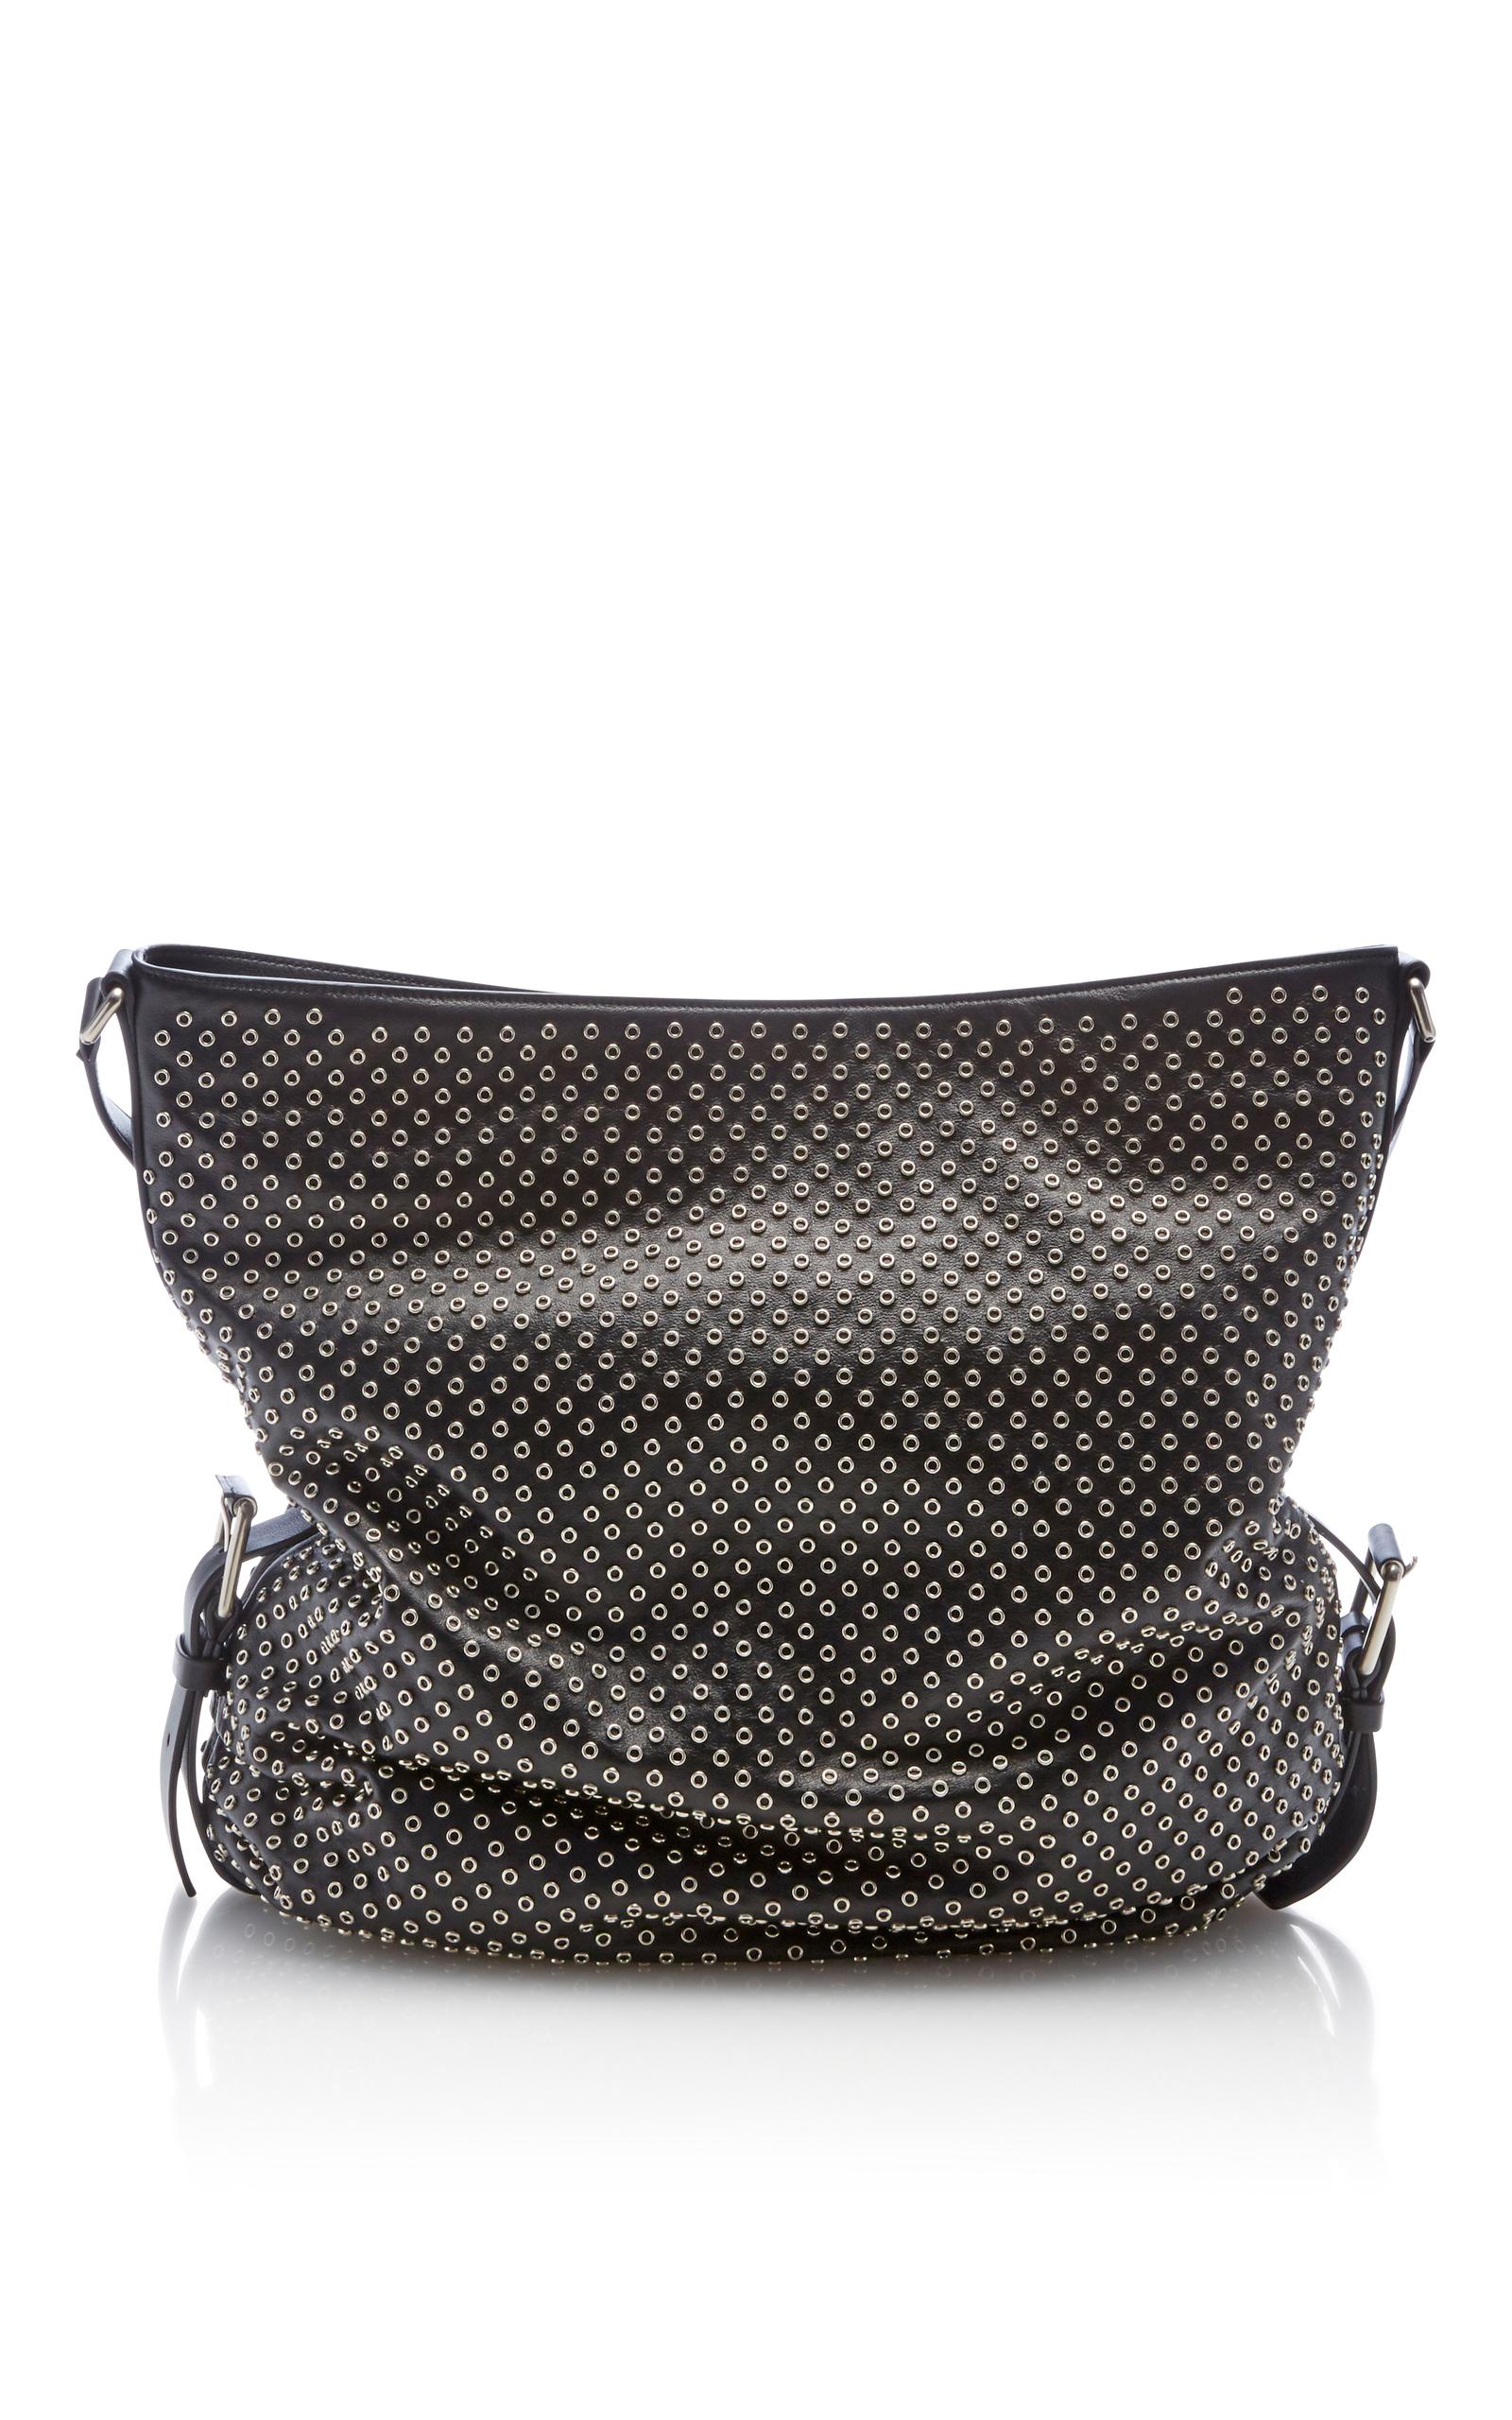 59fe03859364 Michael Kors CollectionLarge Naomi Shoulder Bag with Grommets. CLOSE.  Loading. Loading. Loading. Loading